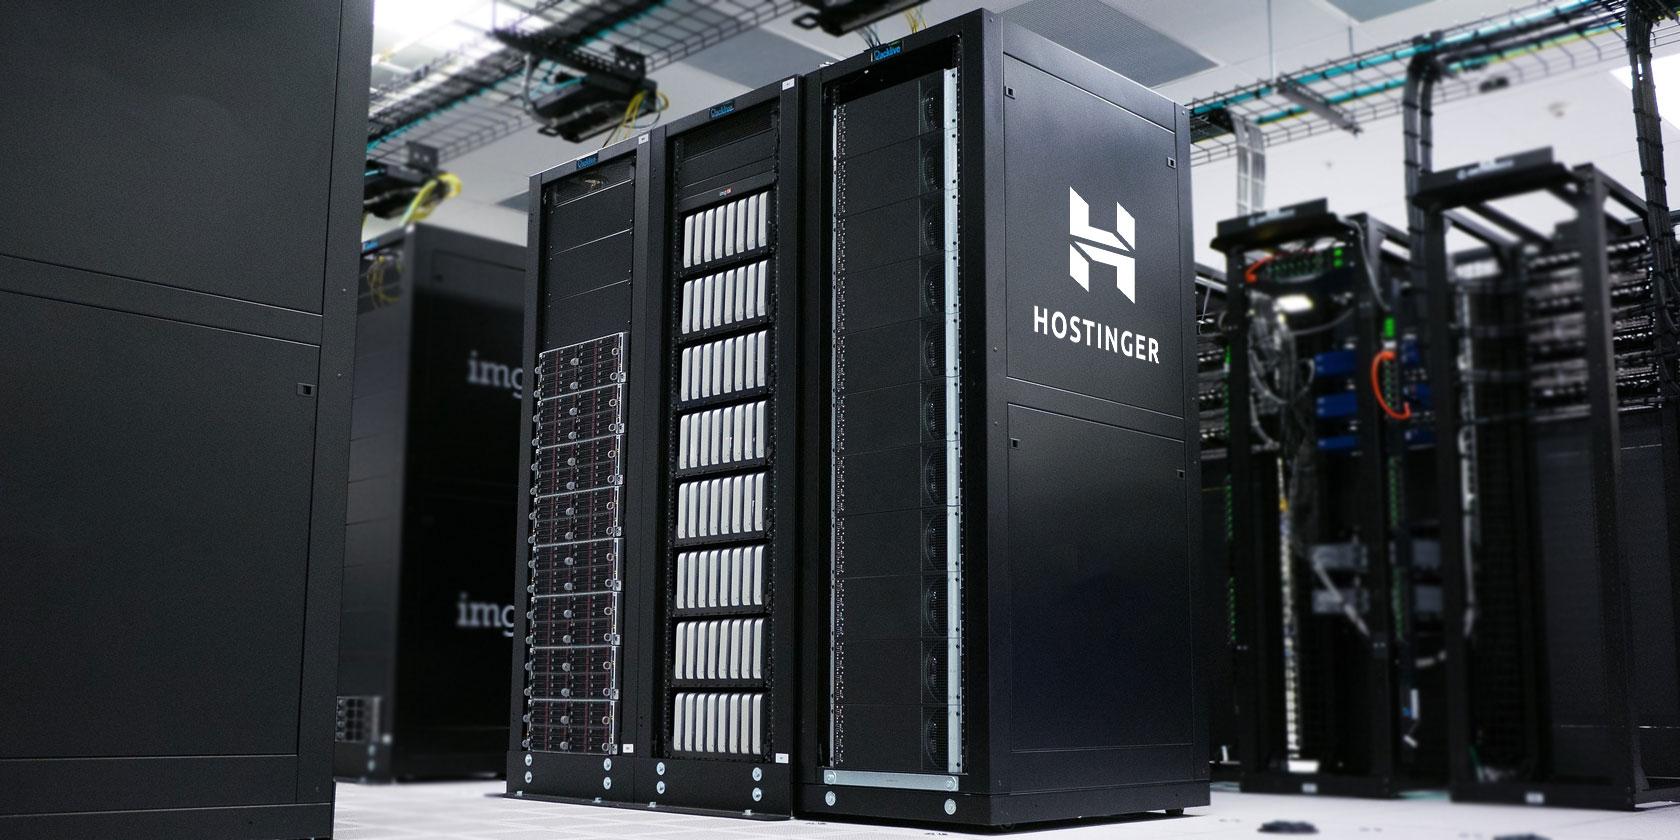 deathmatch dedicated server